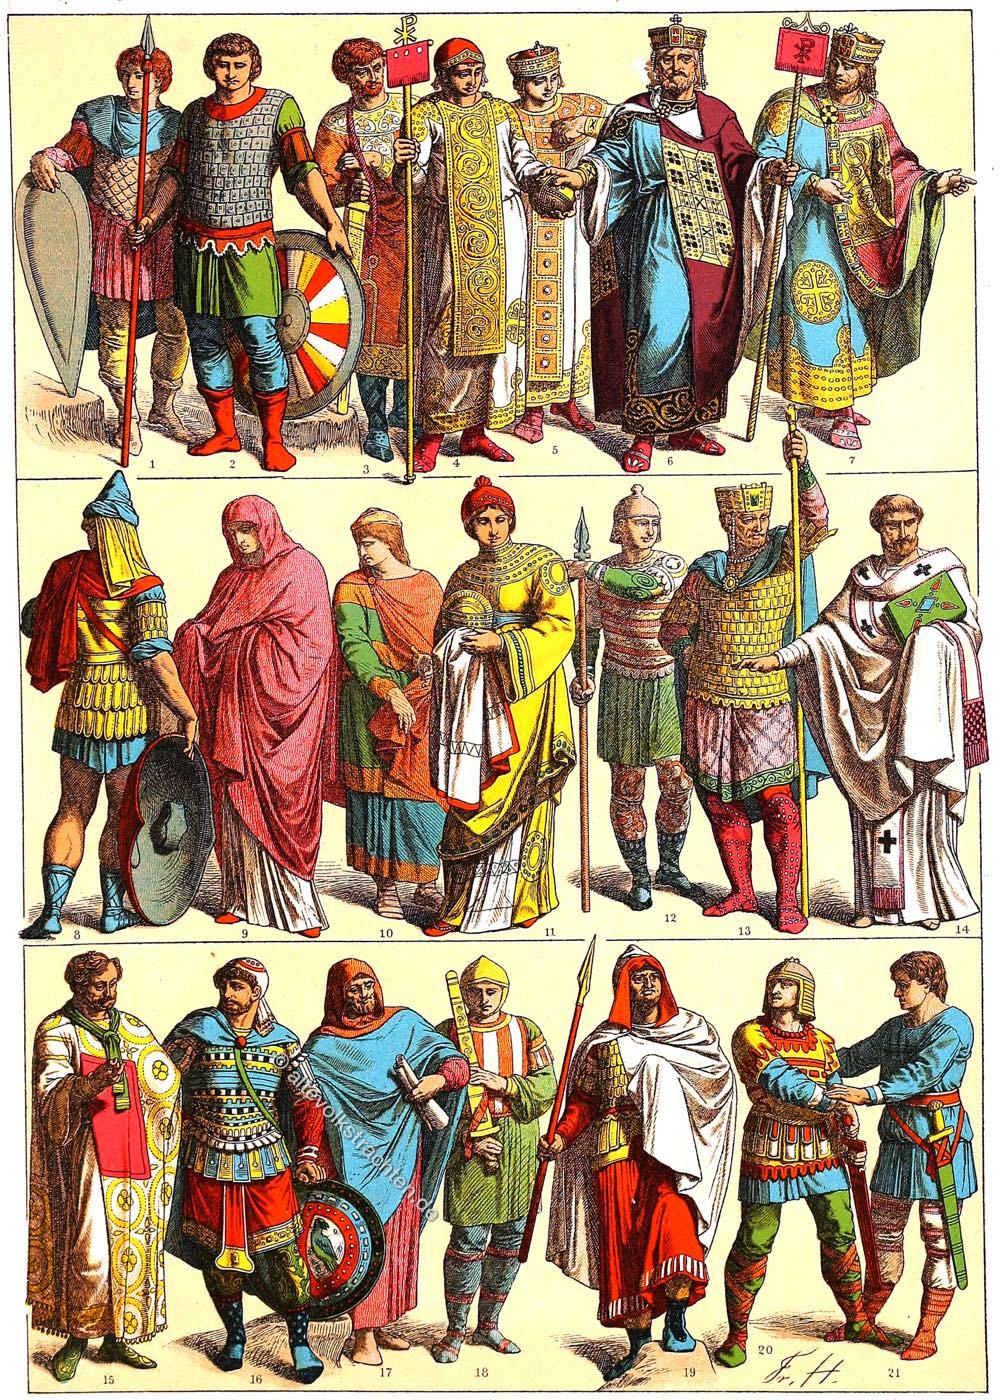 gewandung, Byzanz, Friedrich Hottenroth, Kostüme, Trachten